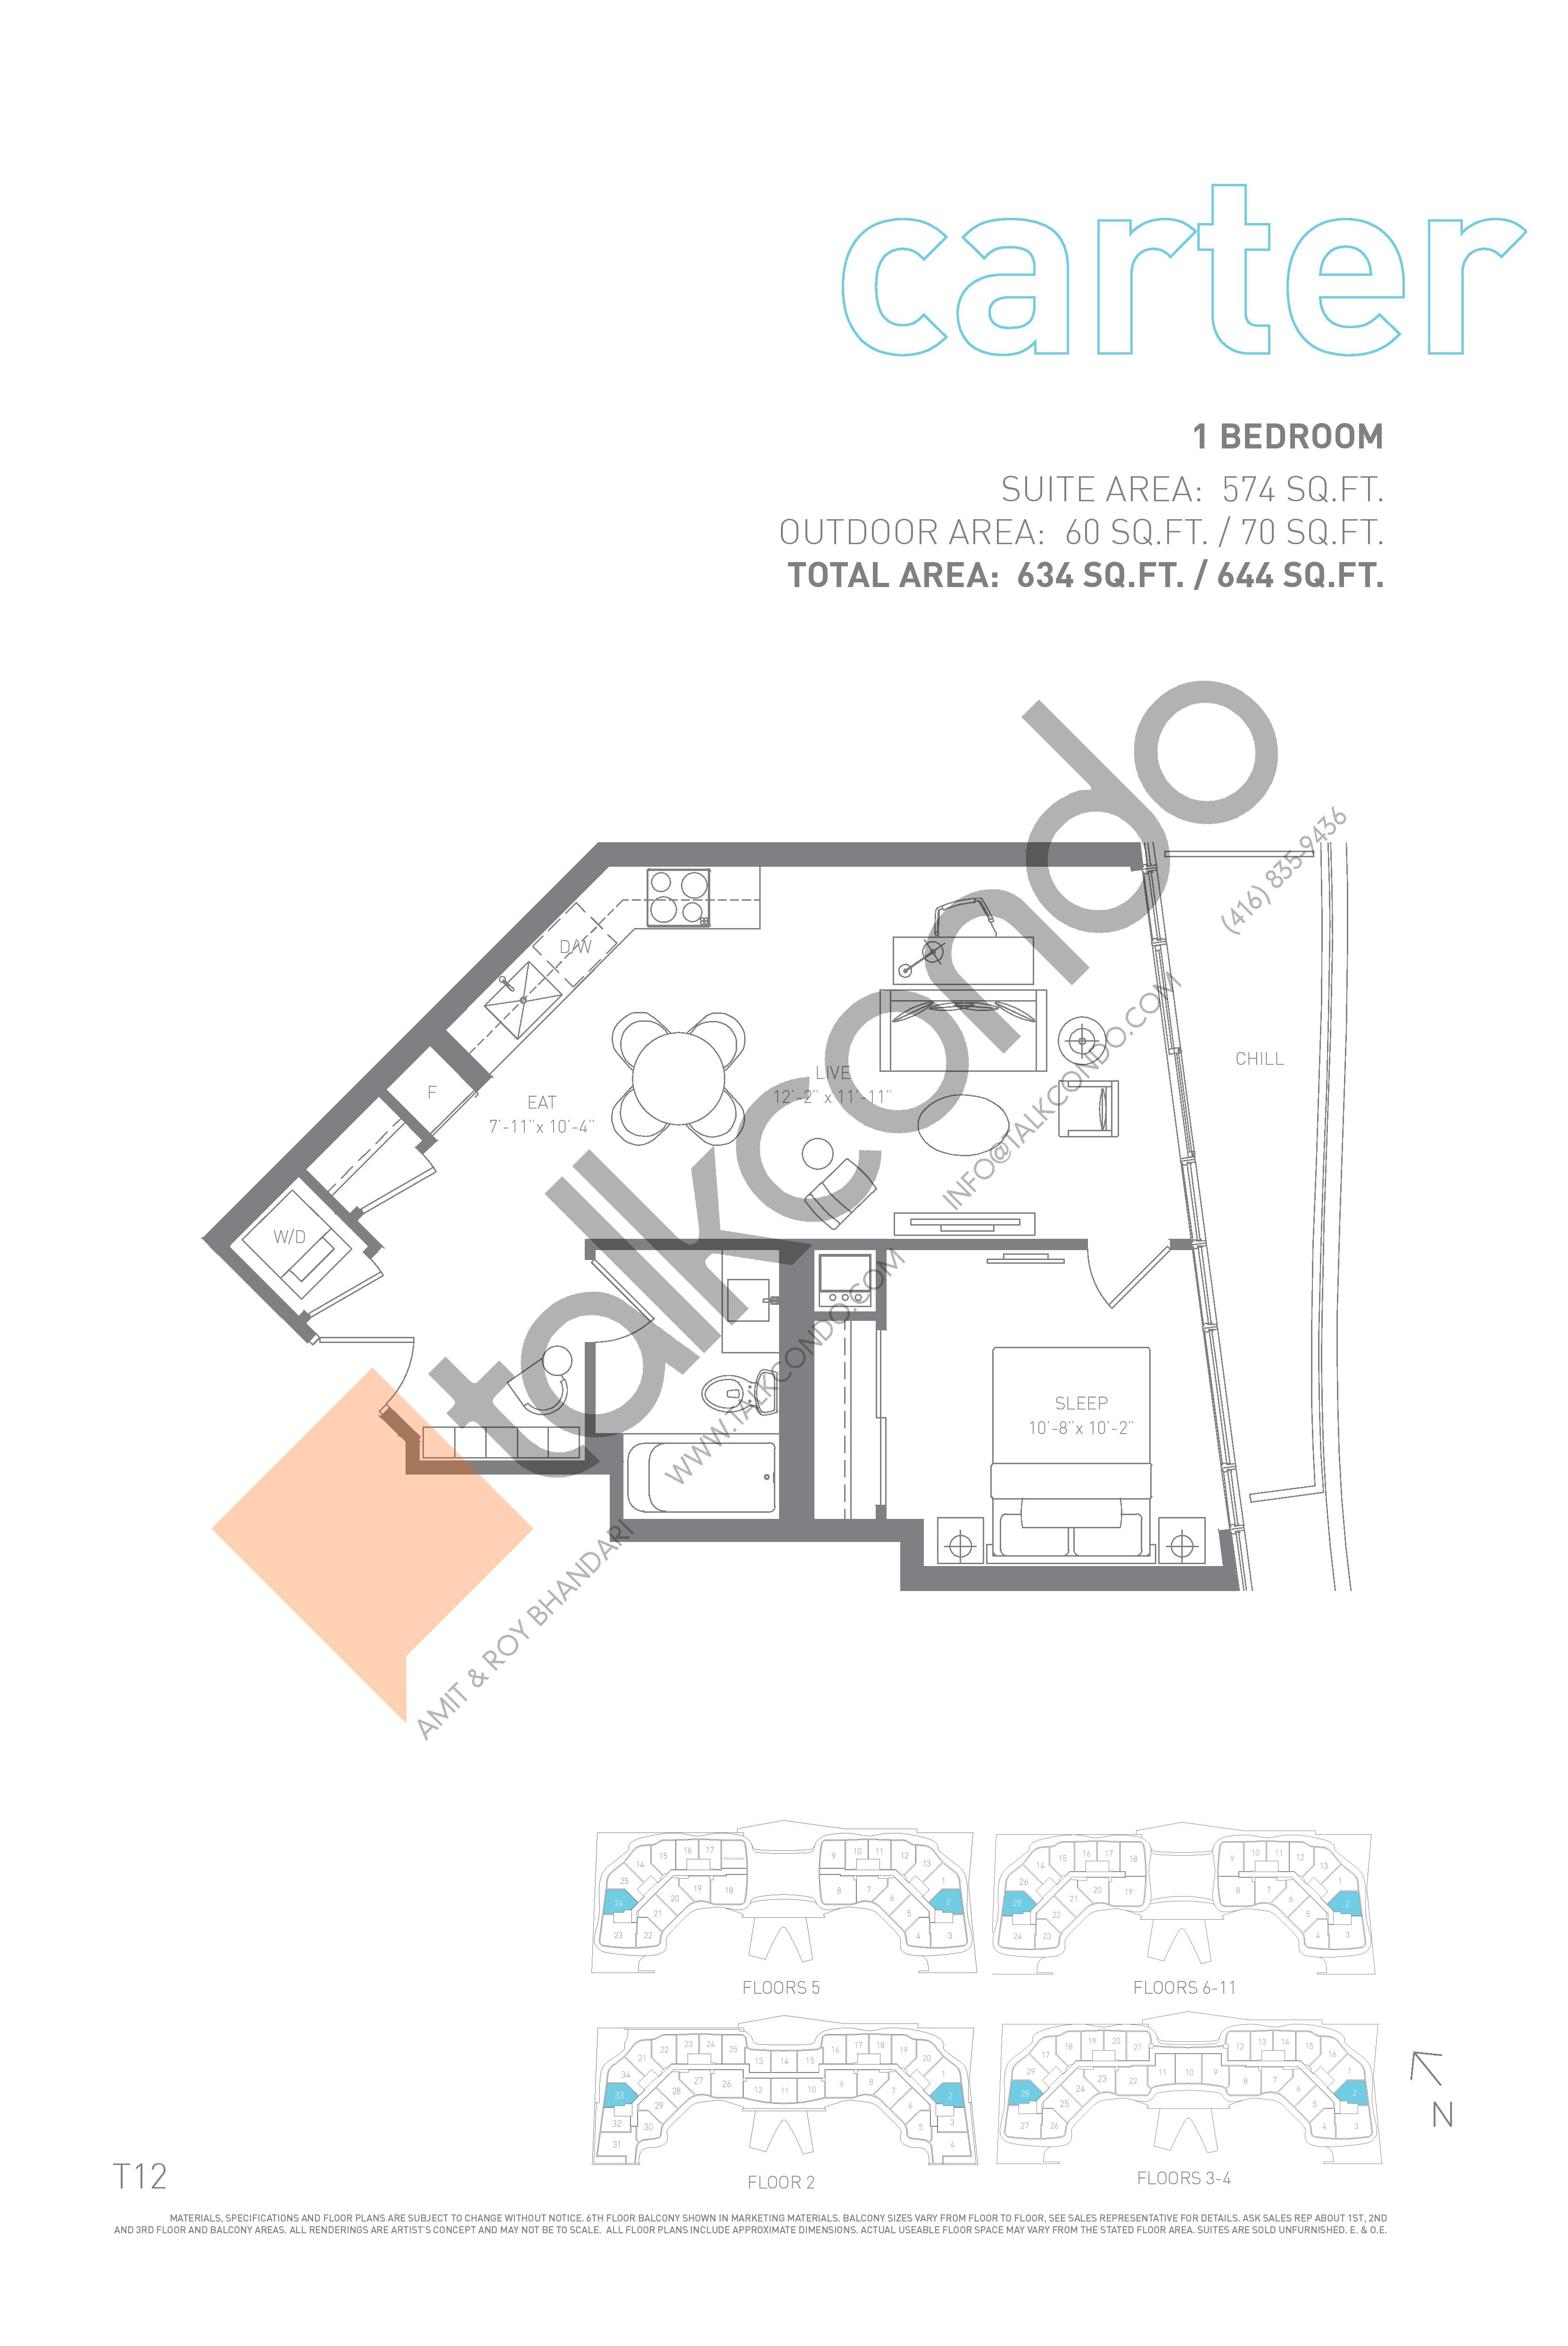 Flaire Condos Floor Plans Prices Availability Talkcondo